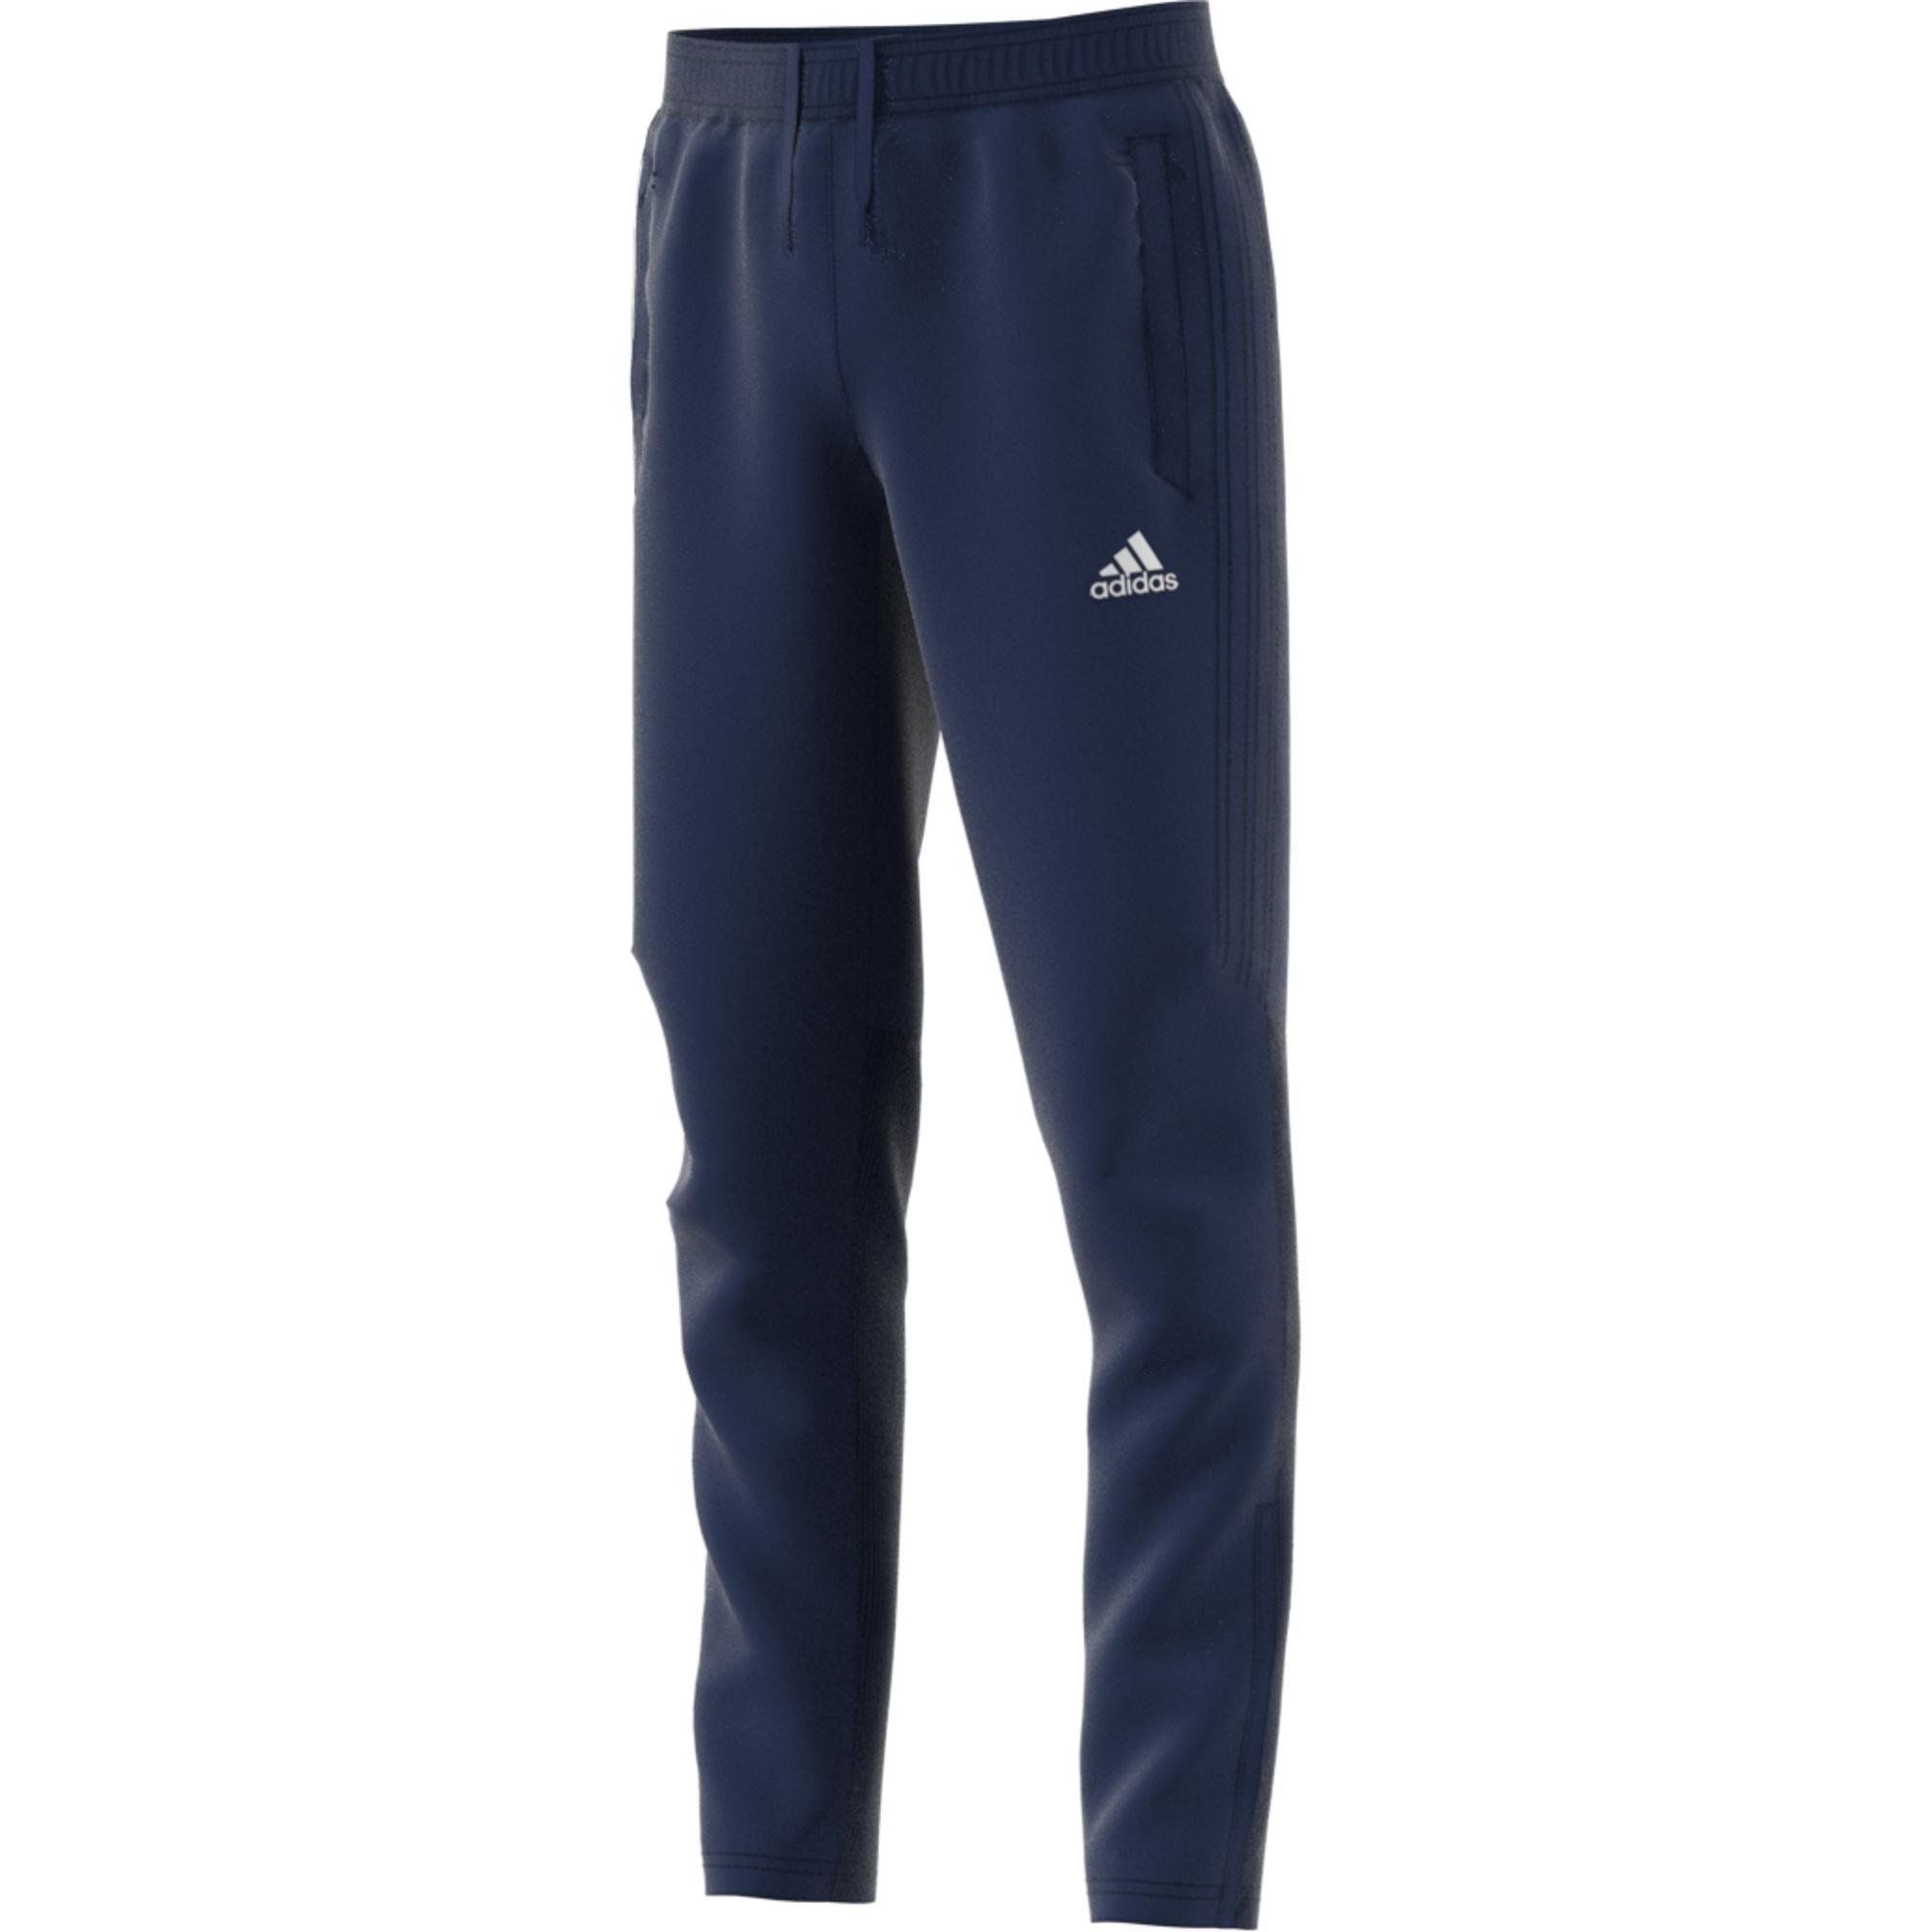 ADIDAS tréninkové kalhoty Tiro 17